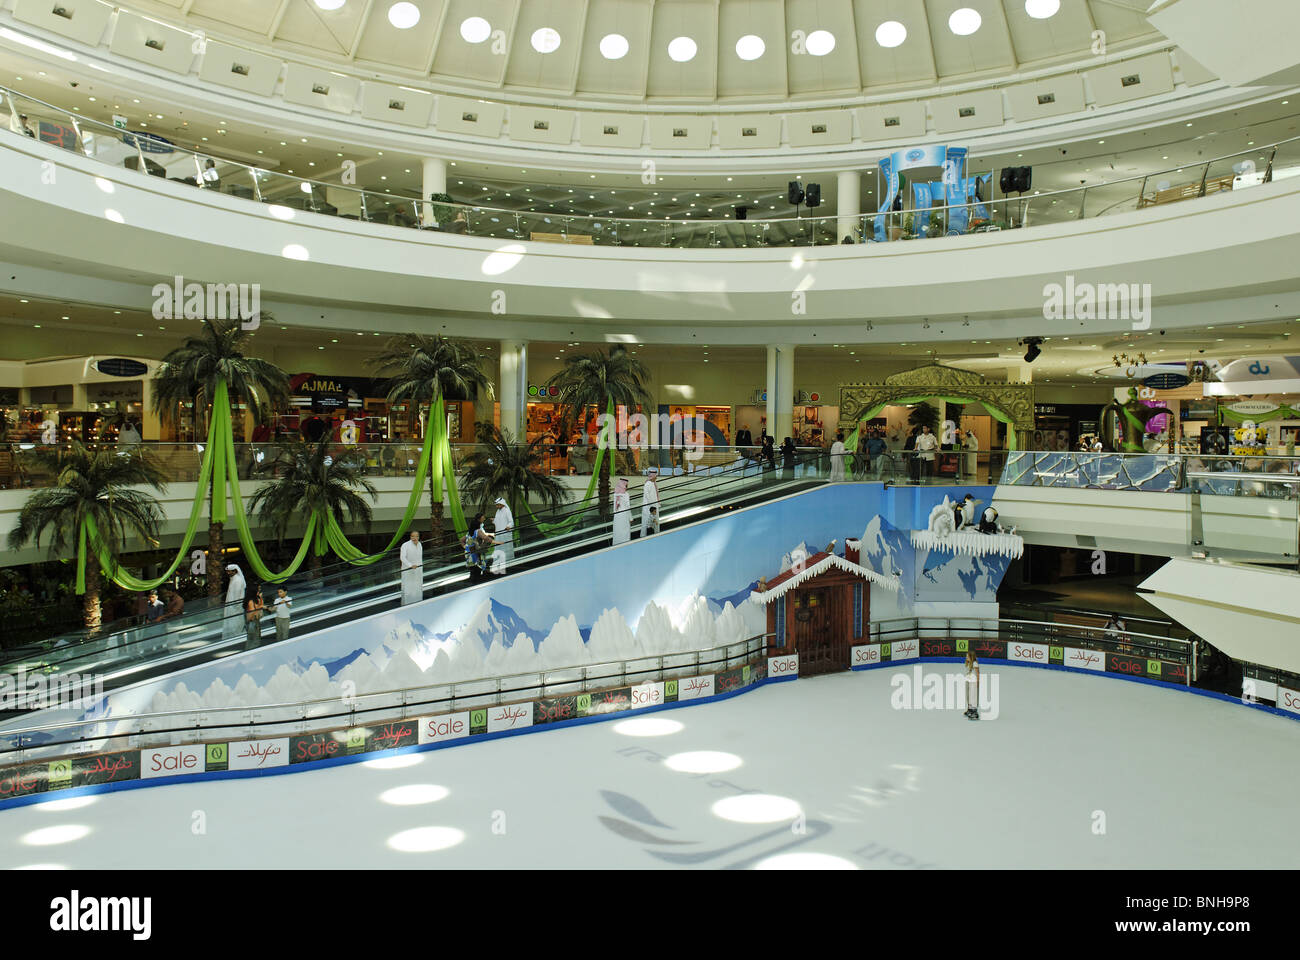 Skating road shopping centre Al Ain Mall Al Ain Abu Dhabi Arabia Arabic building skating skating place spare time - Stock Image